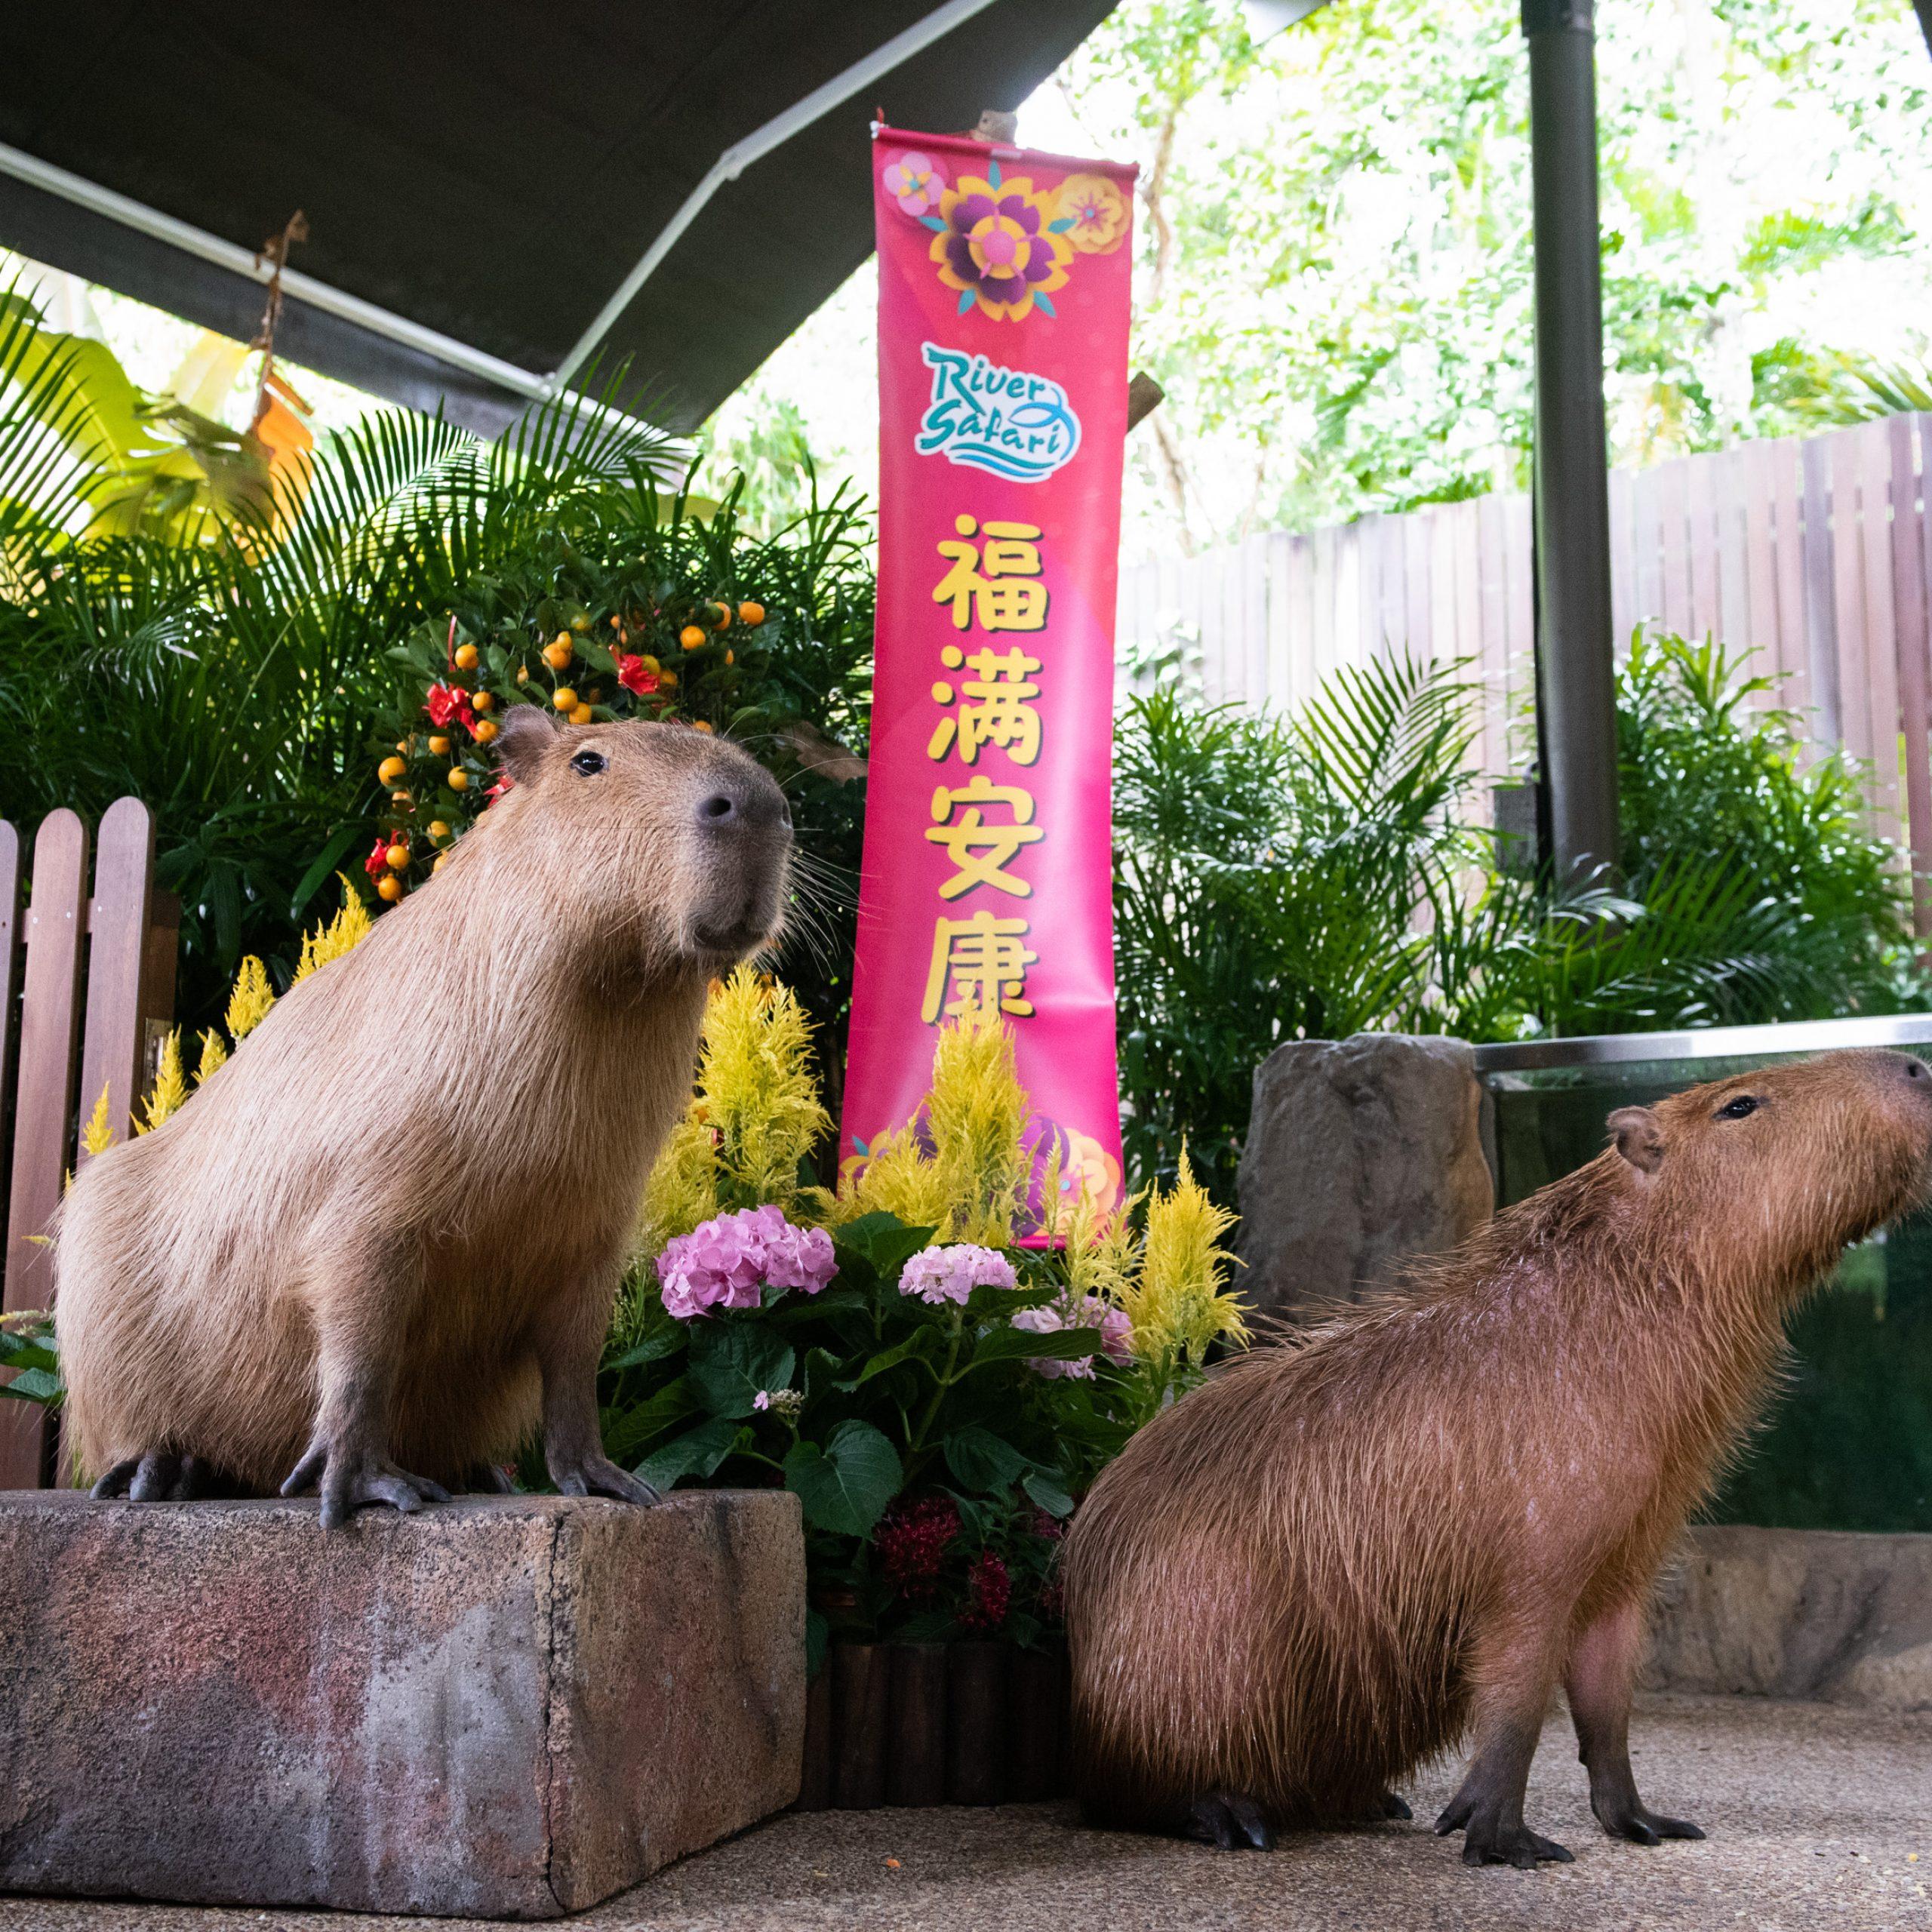 Capybara singapore zoo